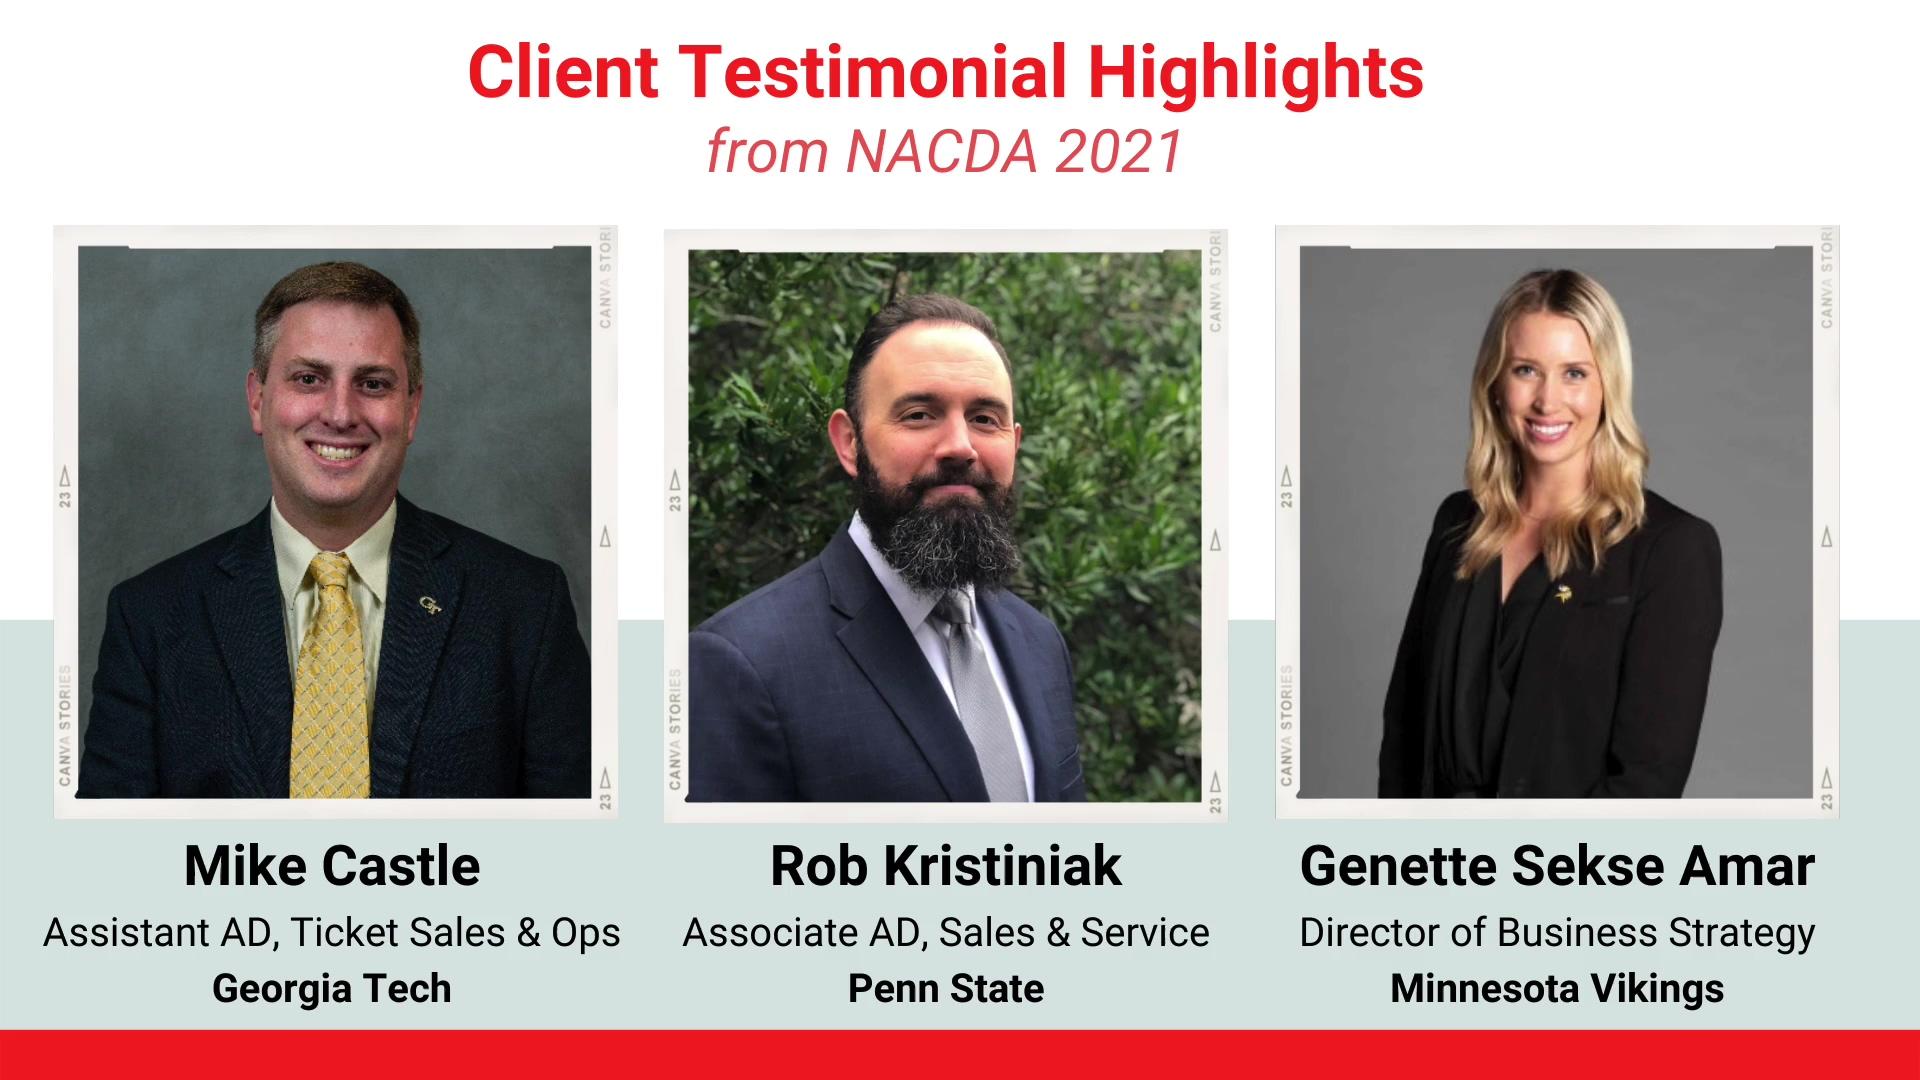 NACDA Client Testimonial Highlights